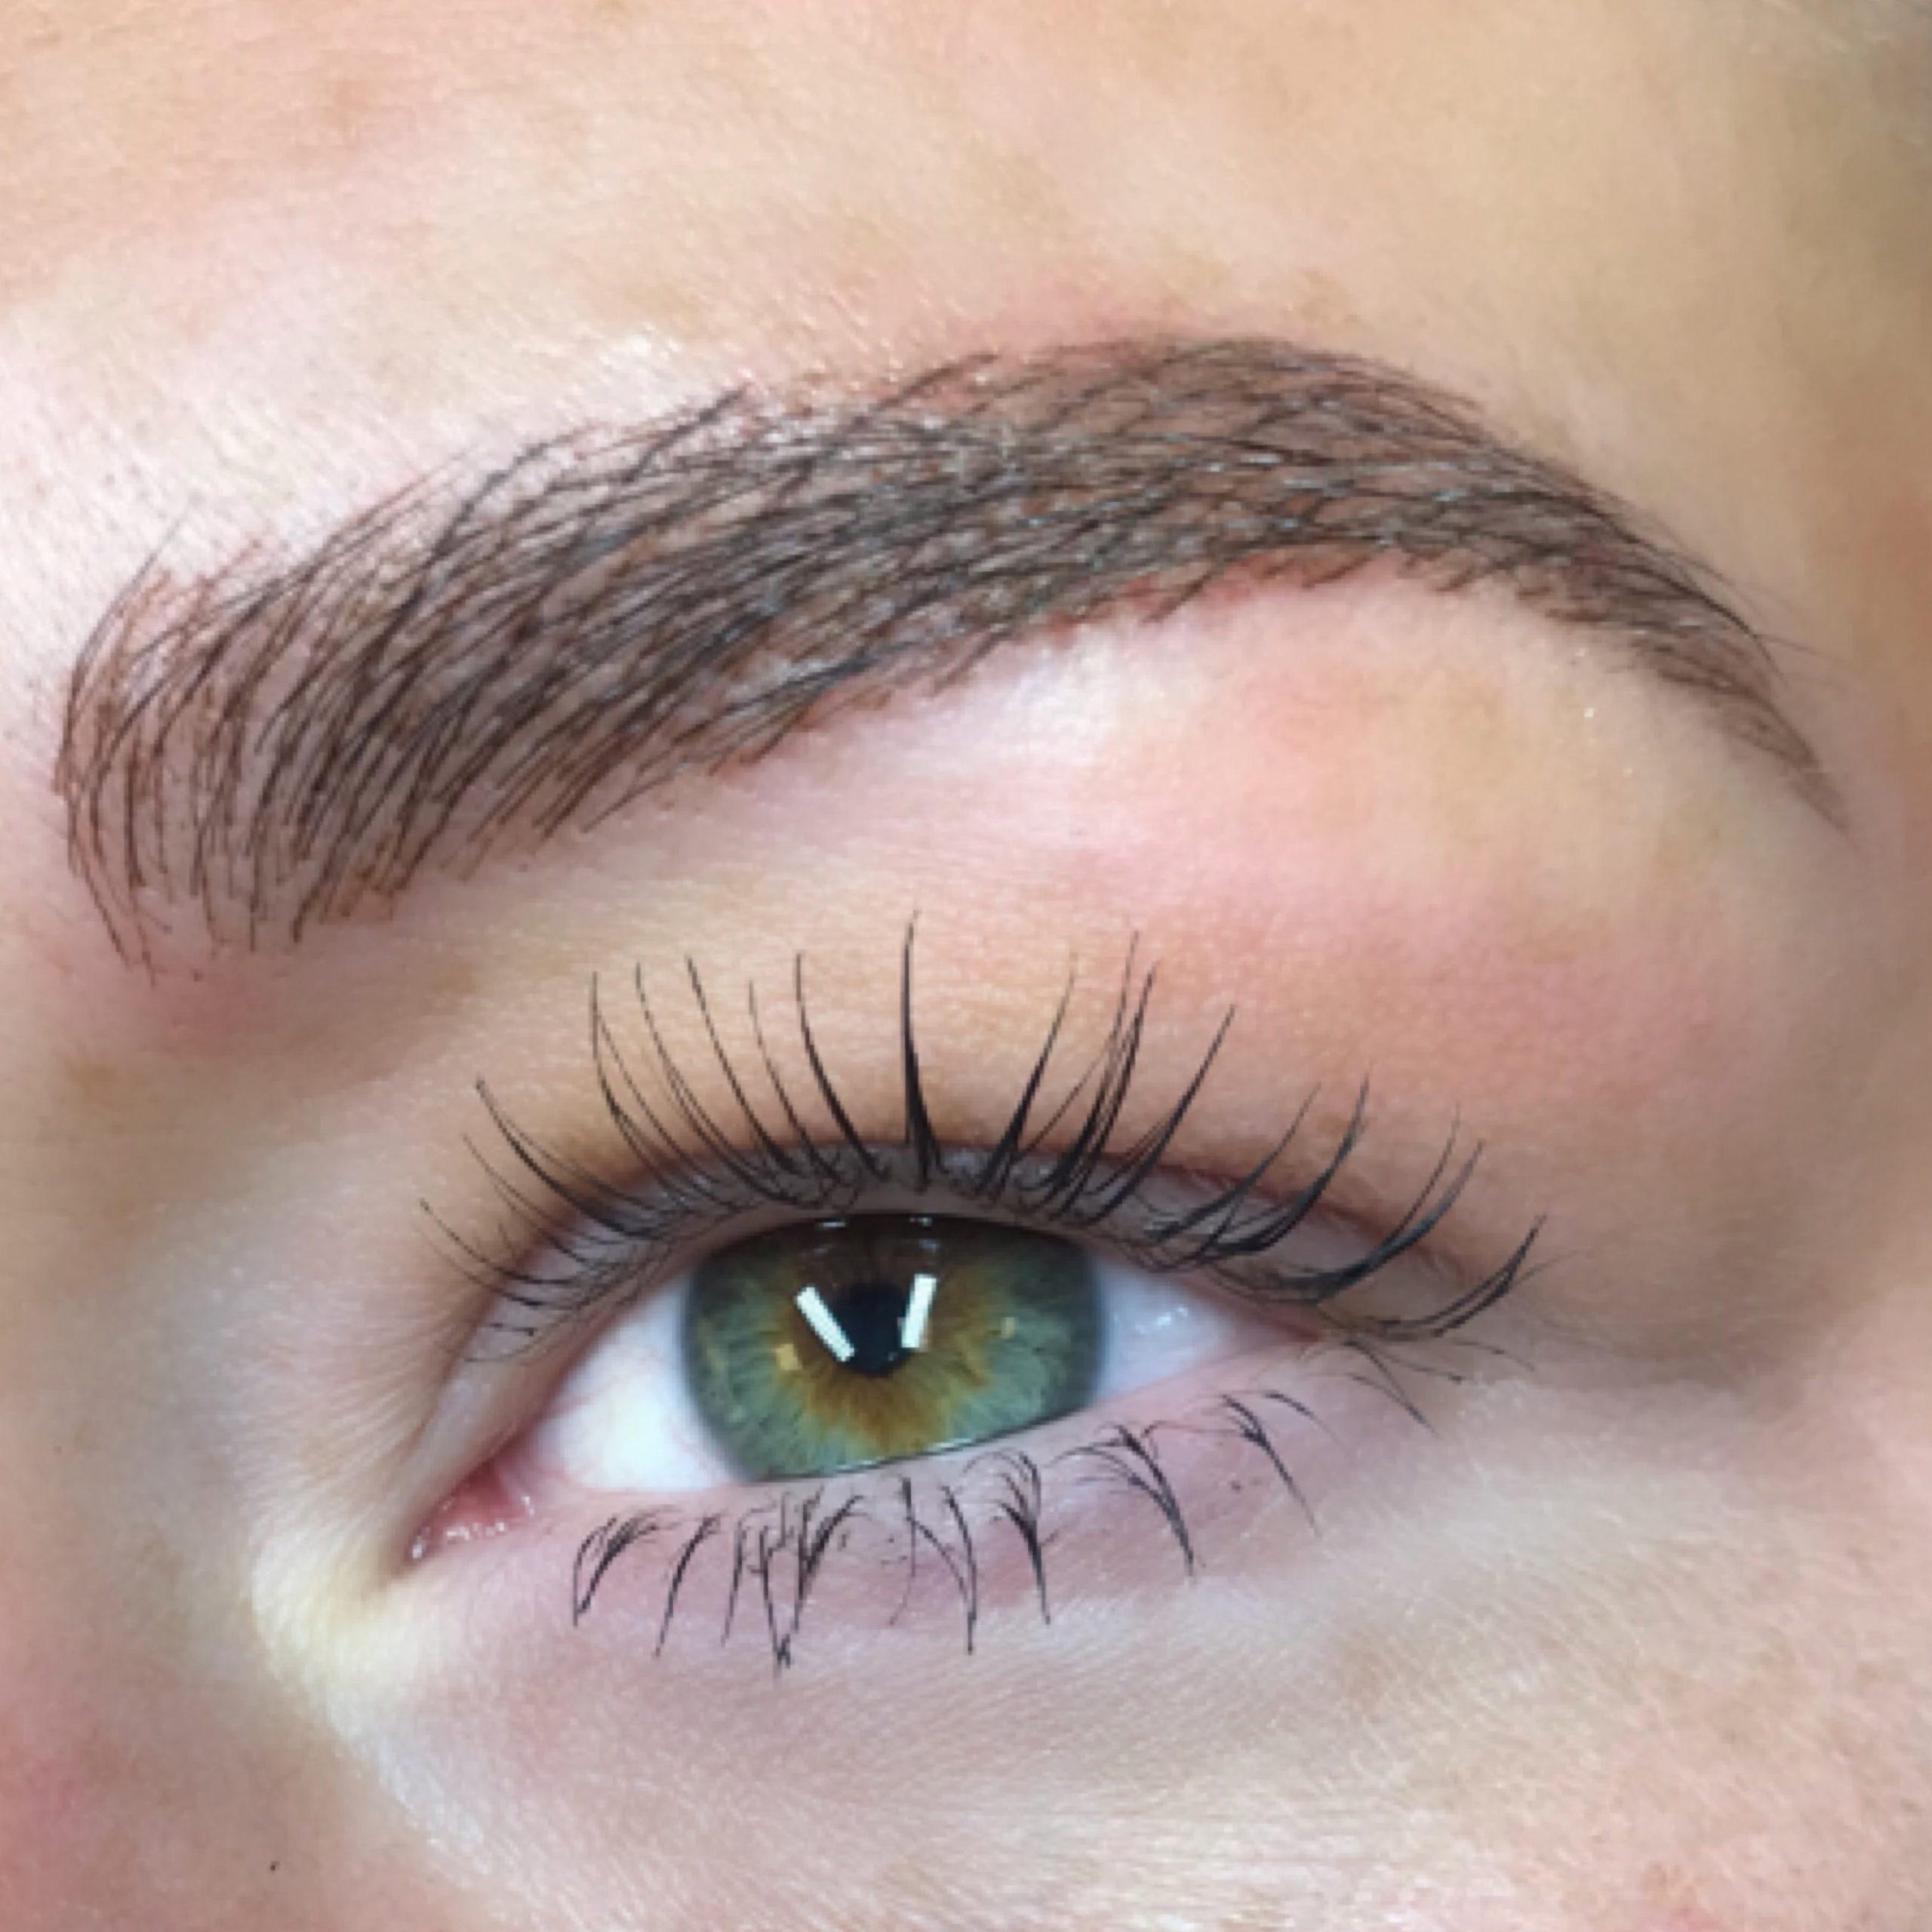 PMU hairstroke brows welll